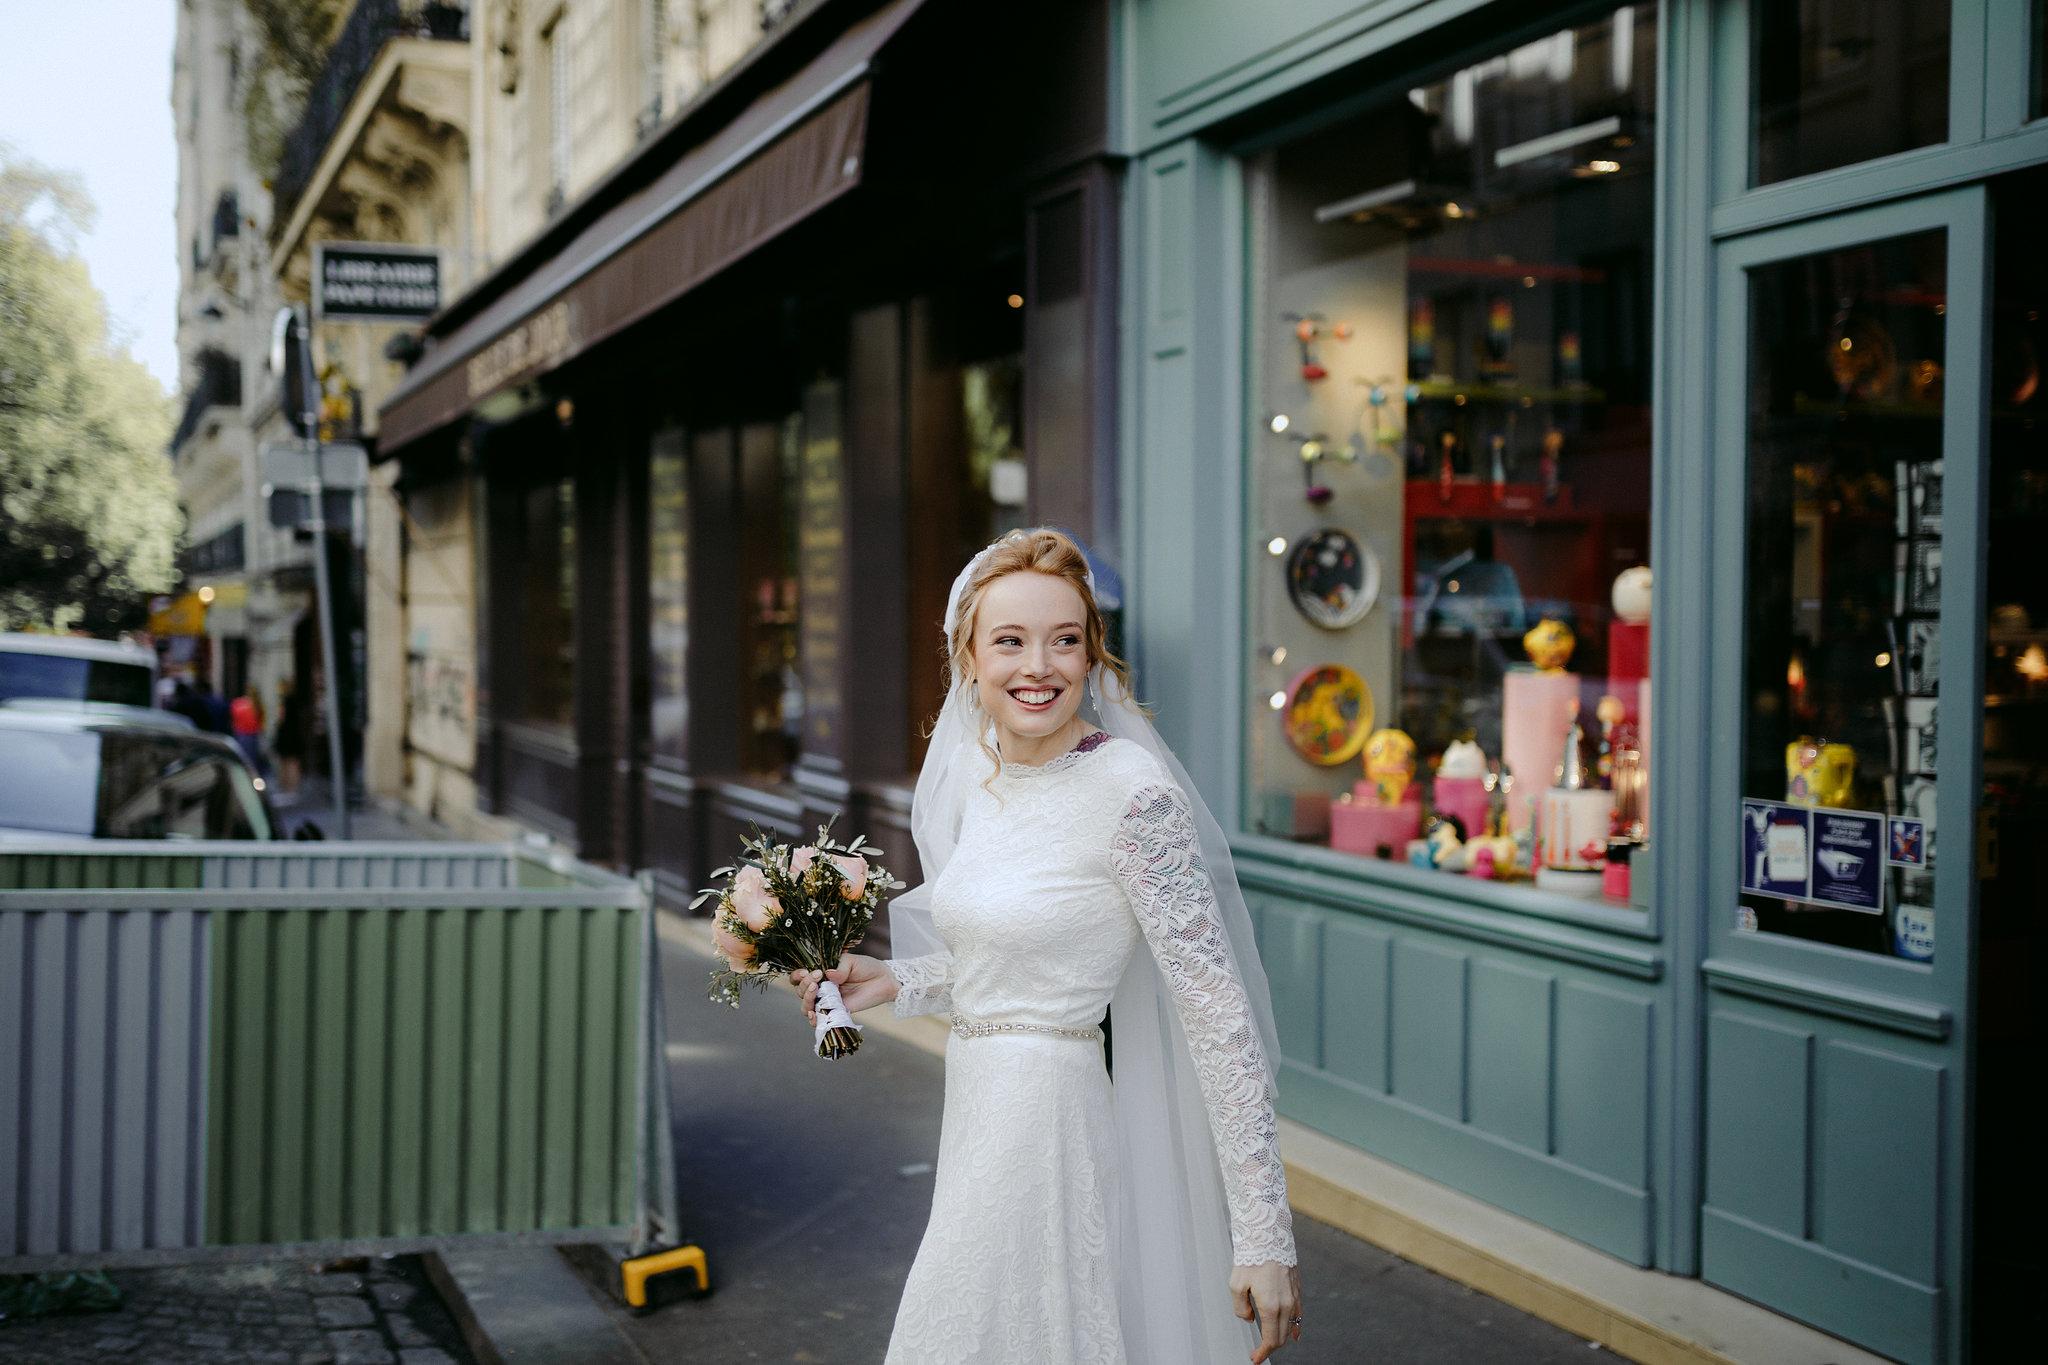 Paris_elopement_wedding_photographer-110.jpg